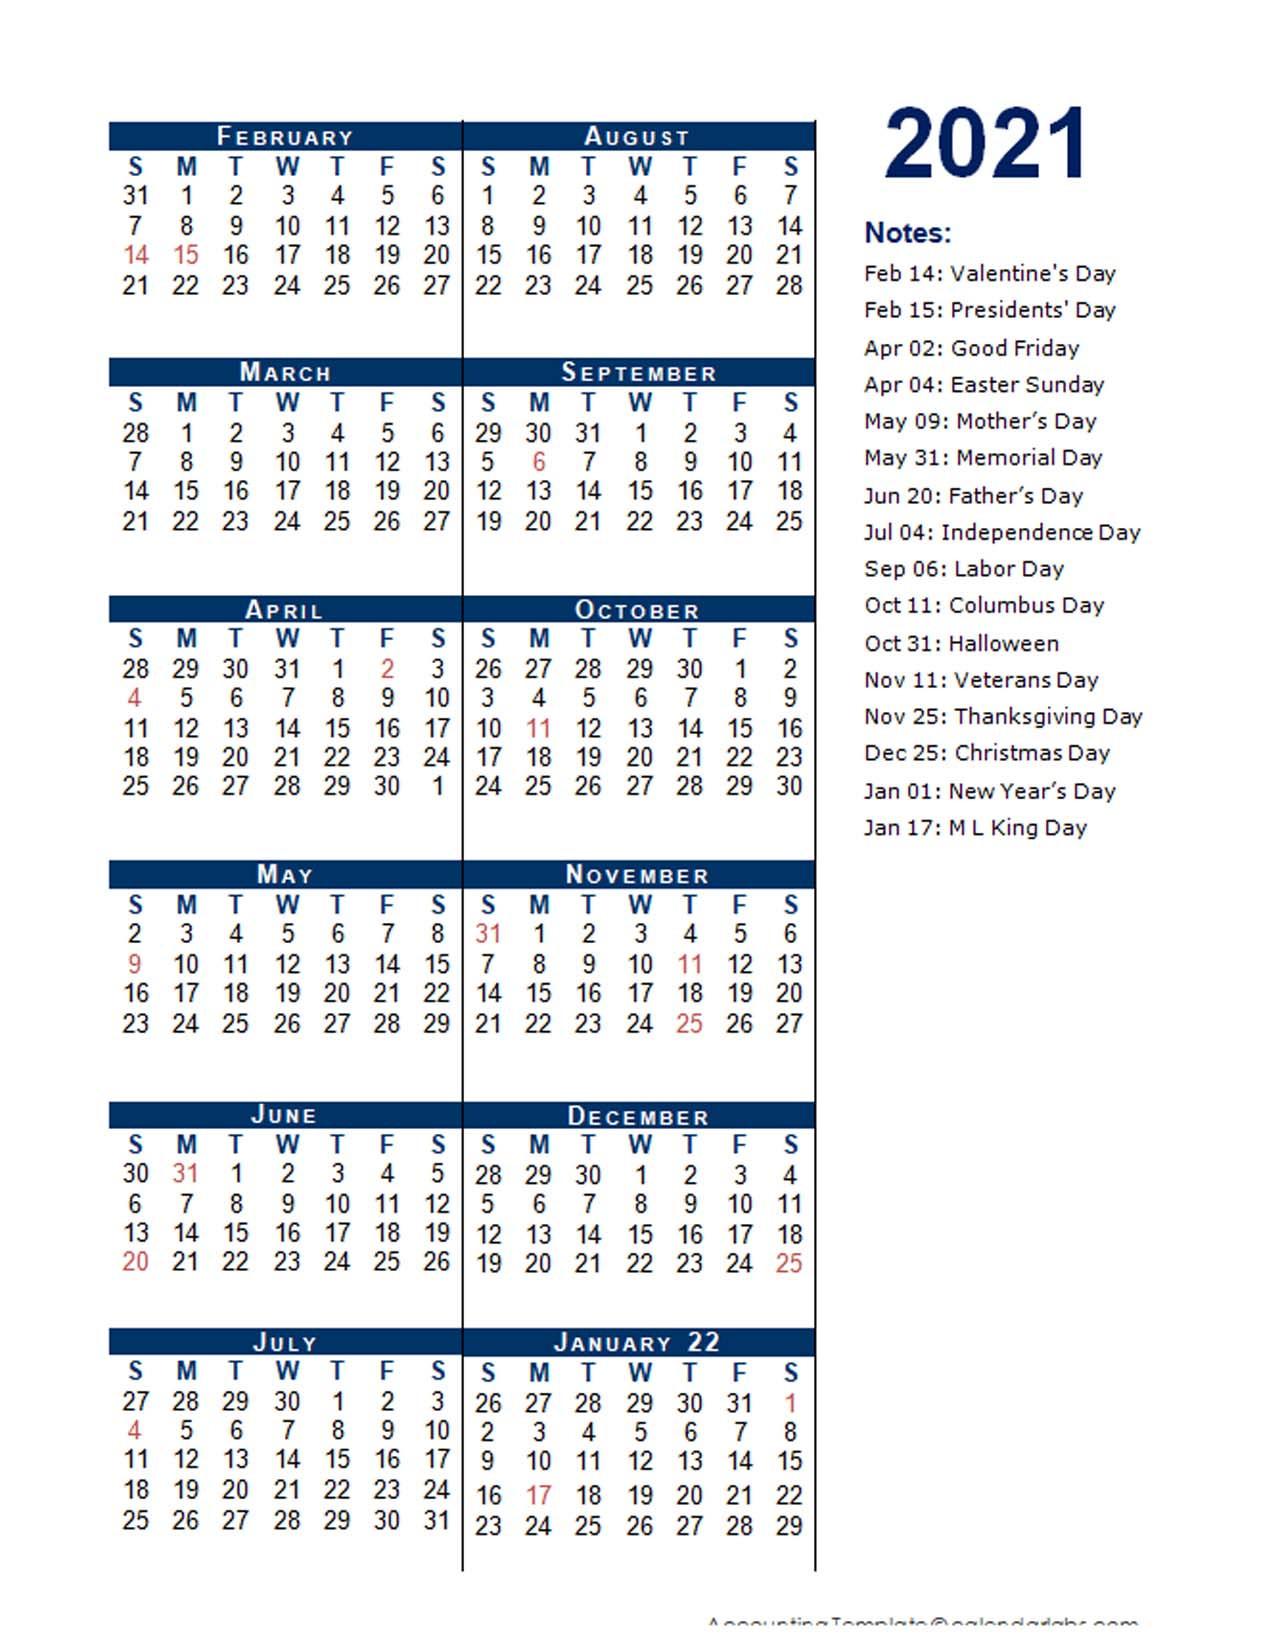 2021 Fiscal Period Calendar 4-4-5 - Free Printable Templates  2021 2021 Financial Year Calendar Australia